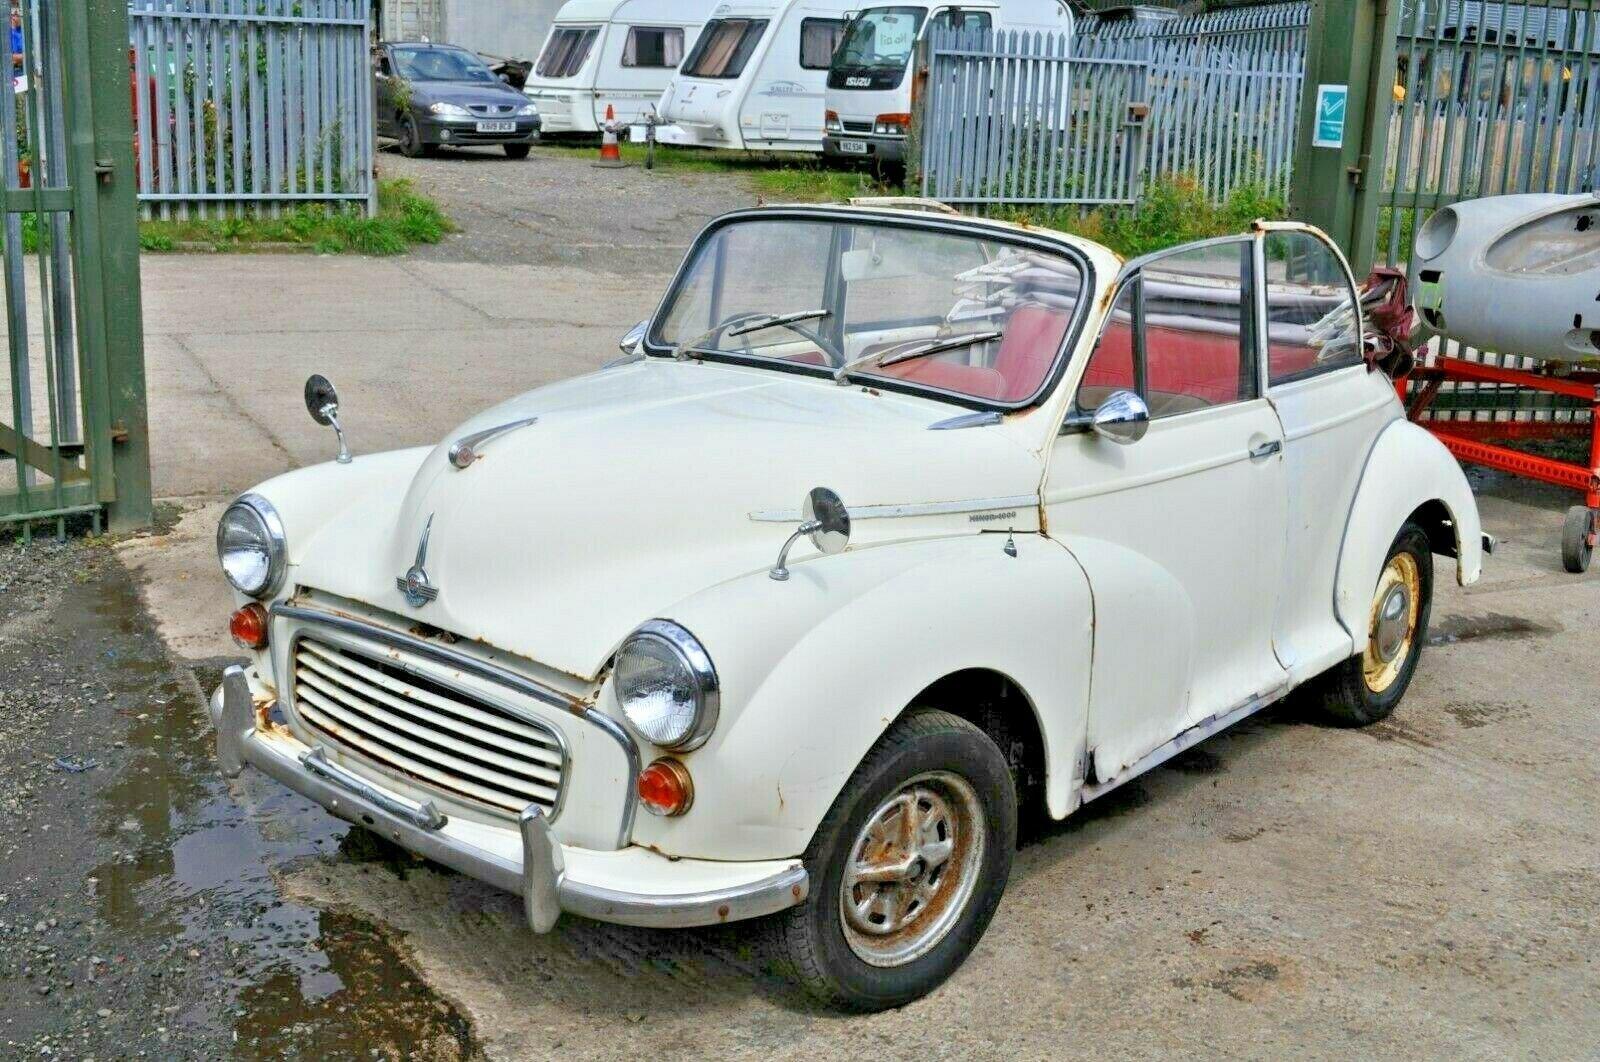 1963 MORRIS MINOR CONVERTIBLE 2 DOOR 1000 CLASSIC CAR PROJECT SOLD (picture 4 of 6)